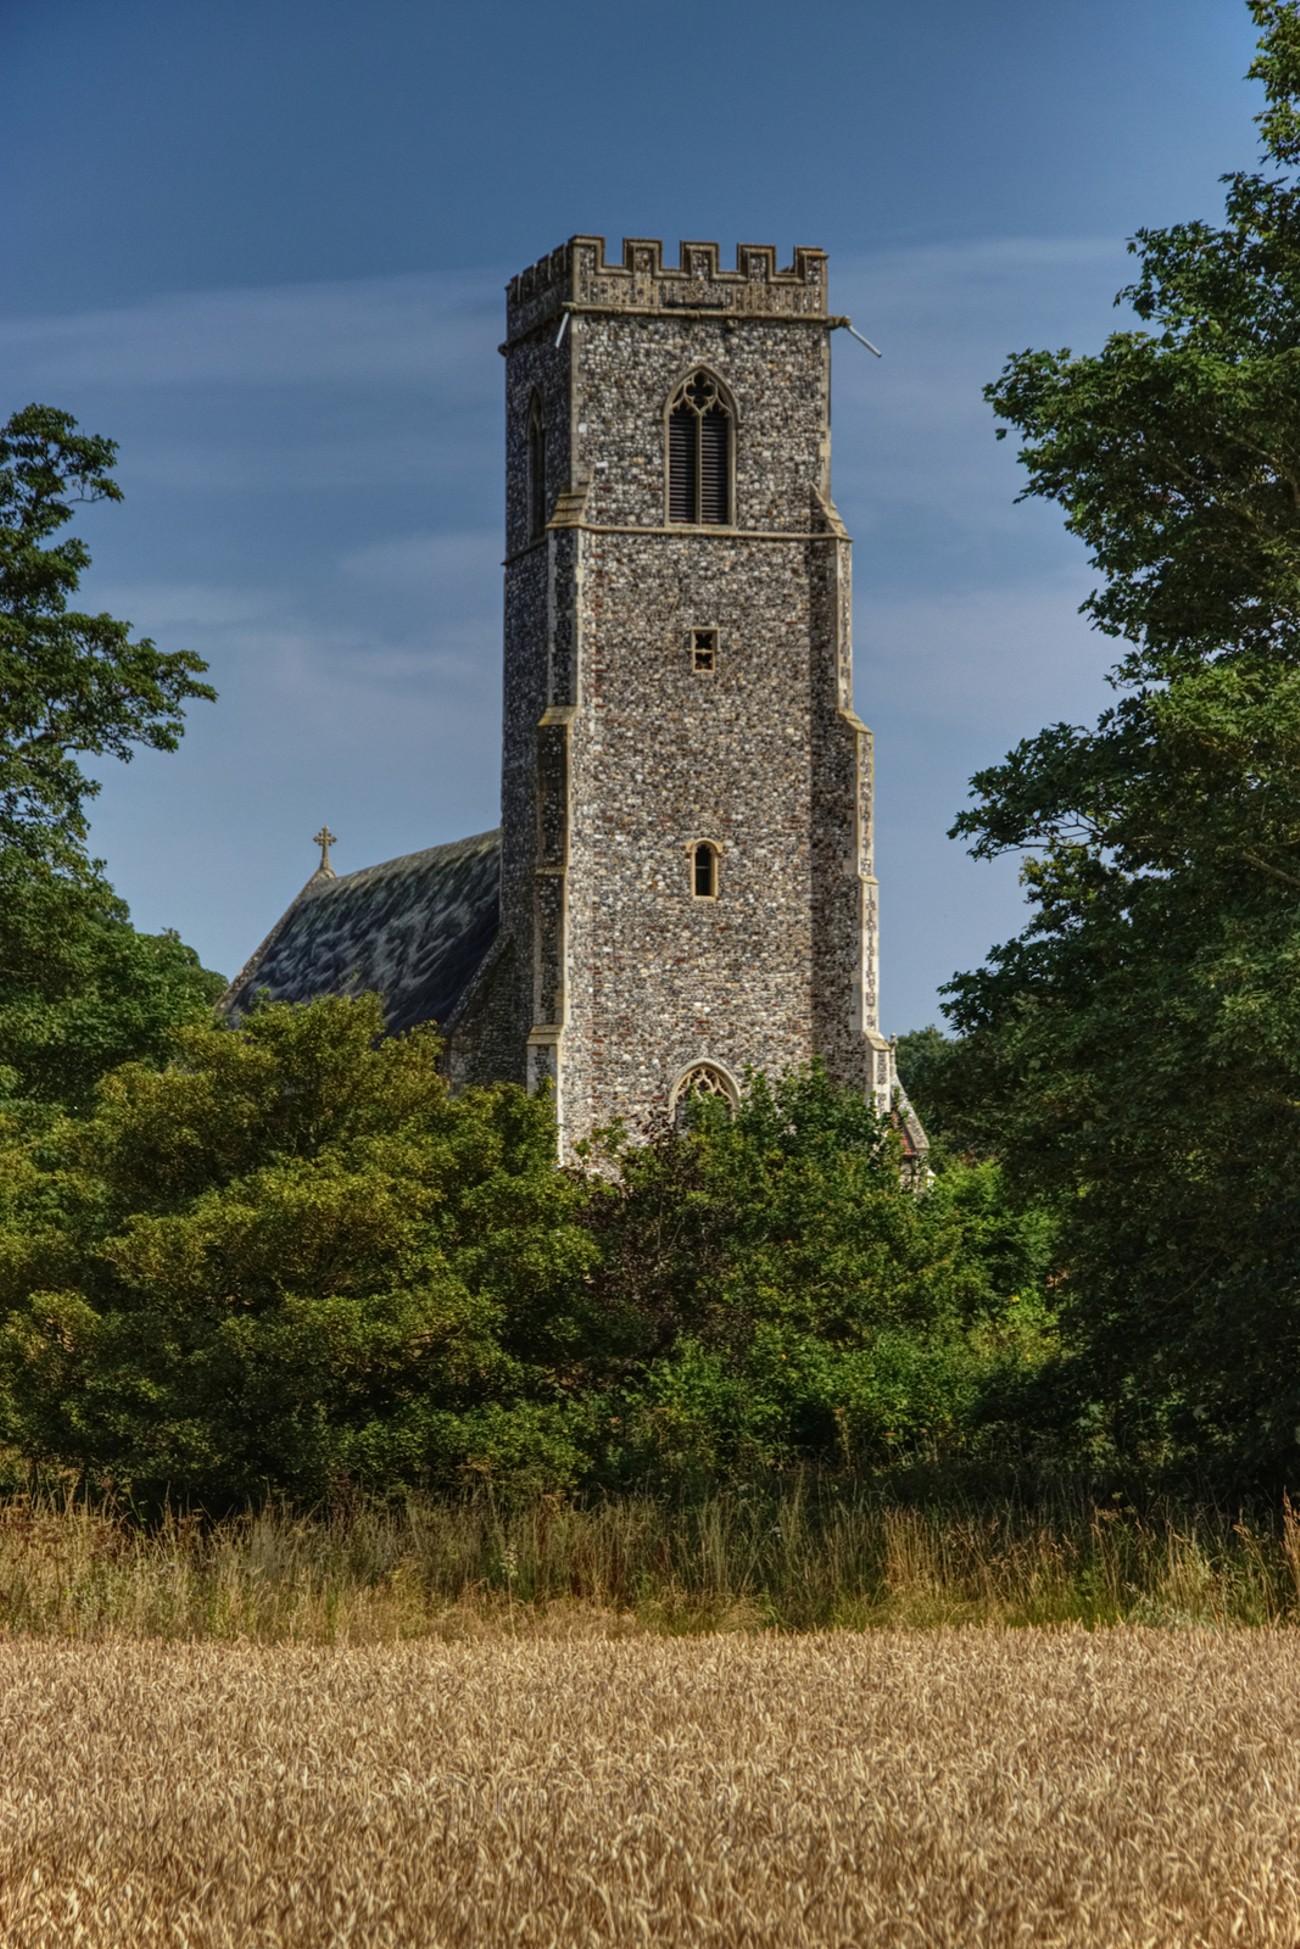 St Nicholas' Church, Wrentham, Suffolk, UK